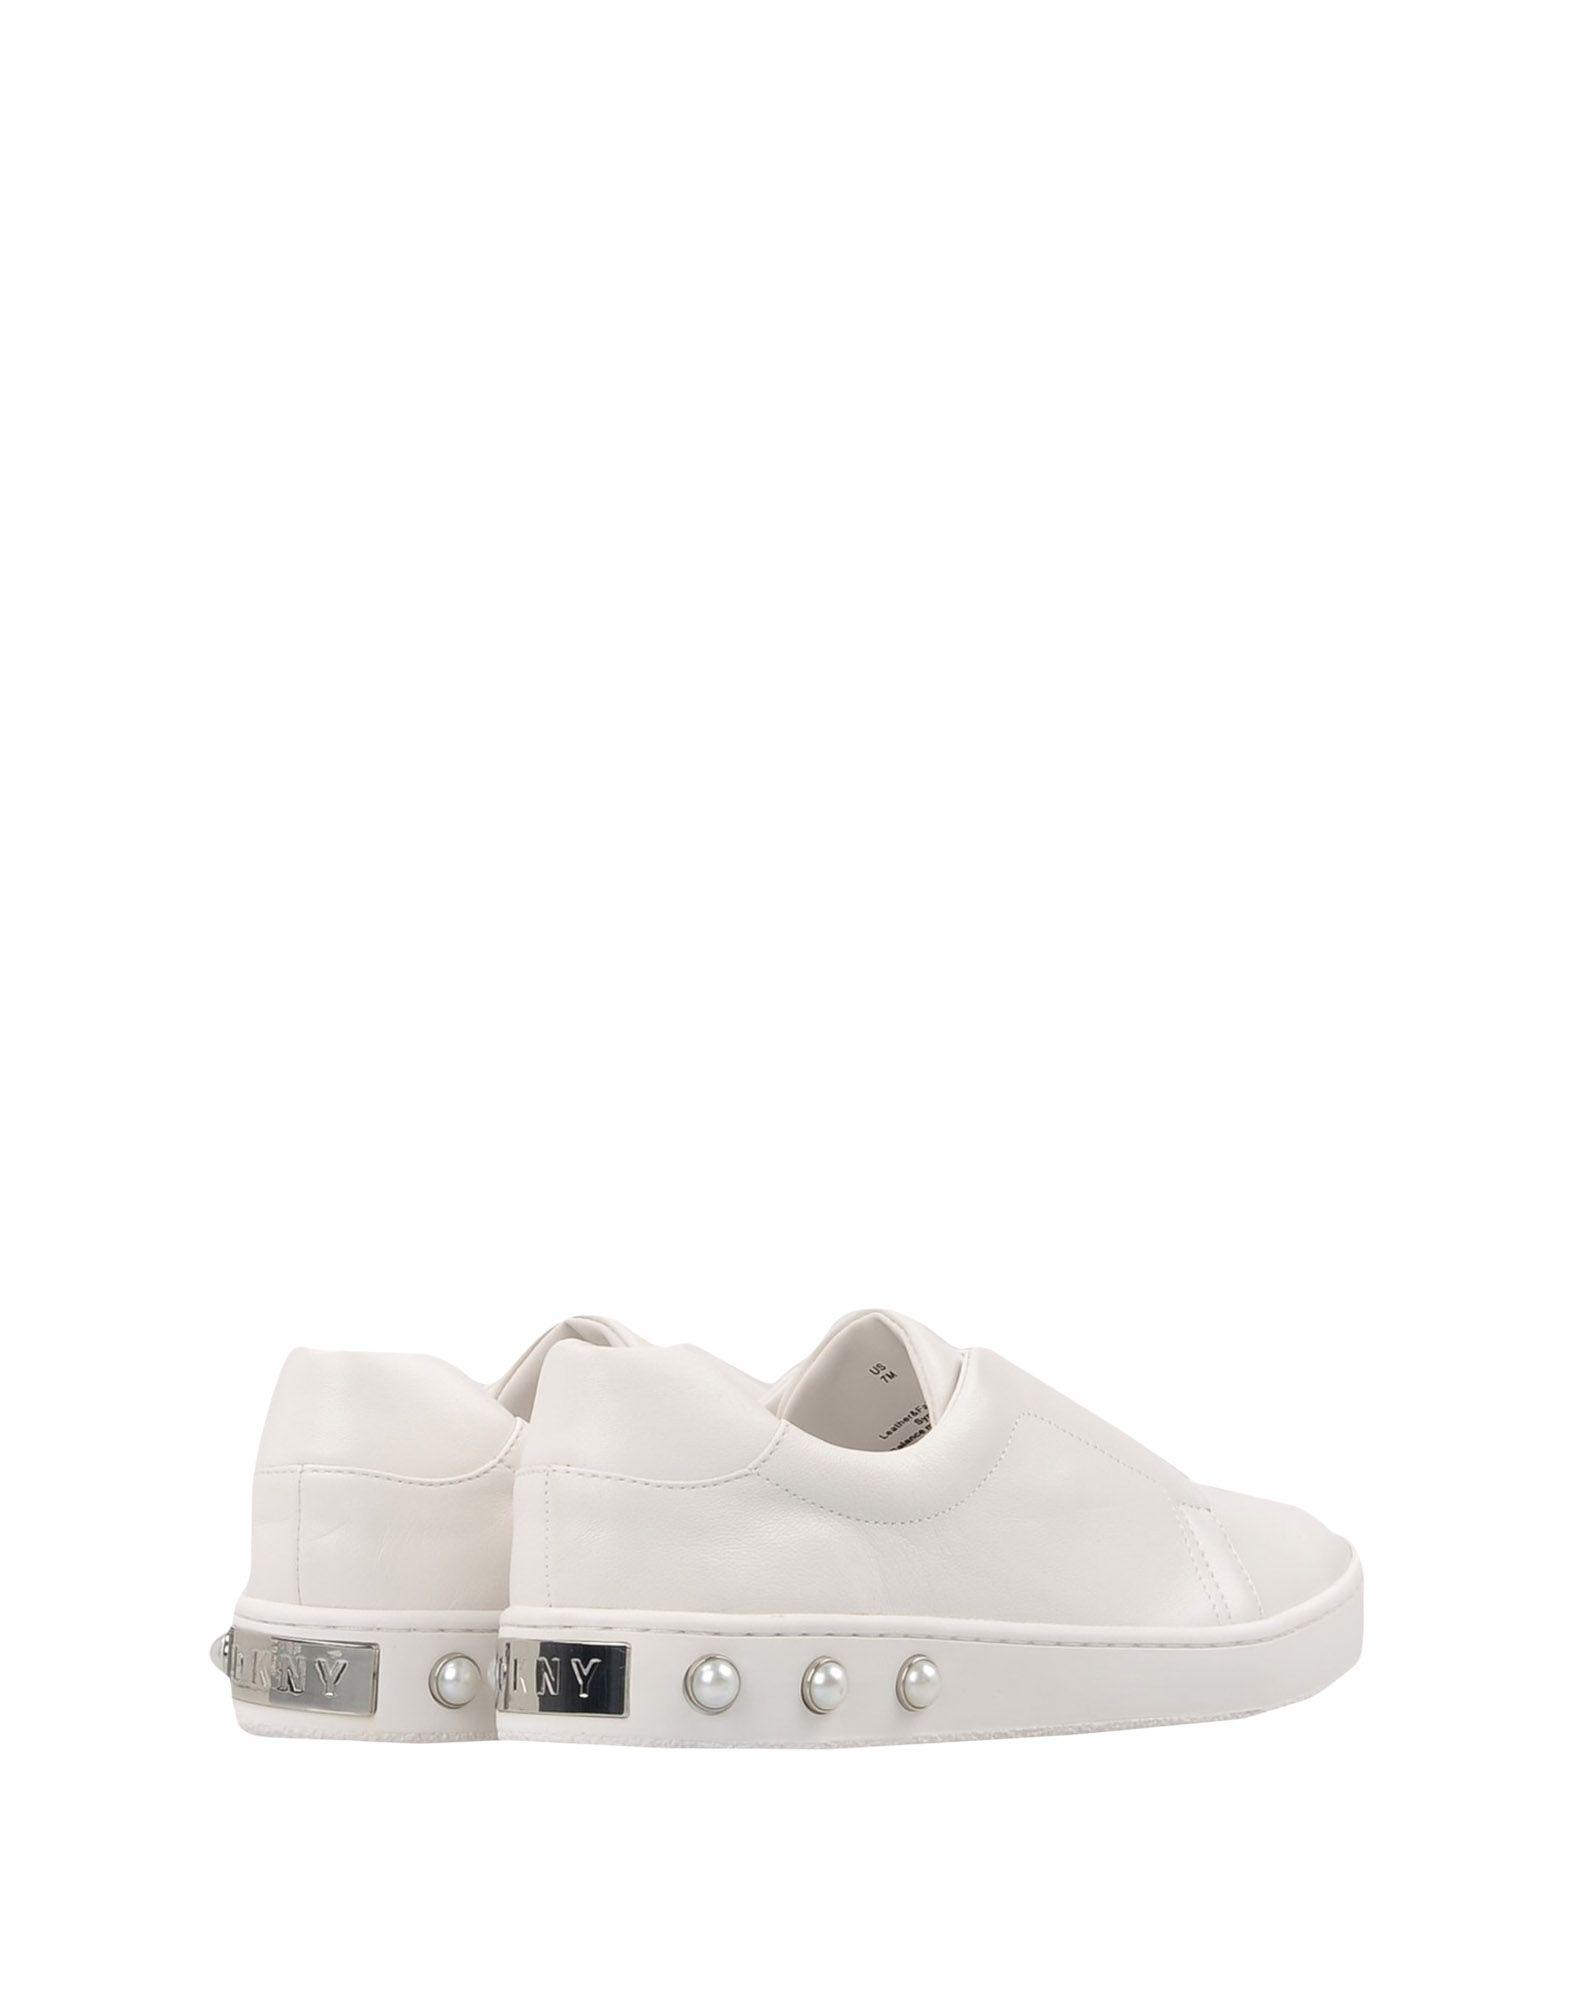 Sneakers Dkny Bobbi Hardware - Sli - Femme - Sneakers Dkny sur